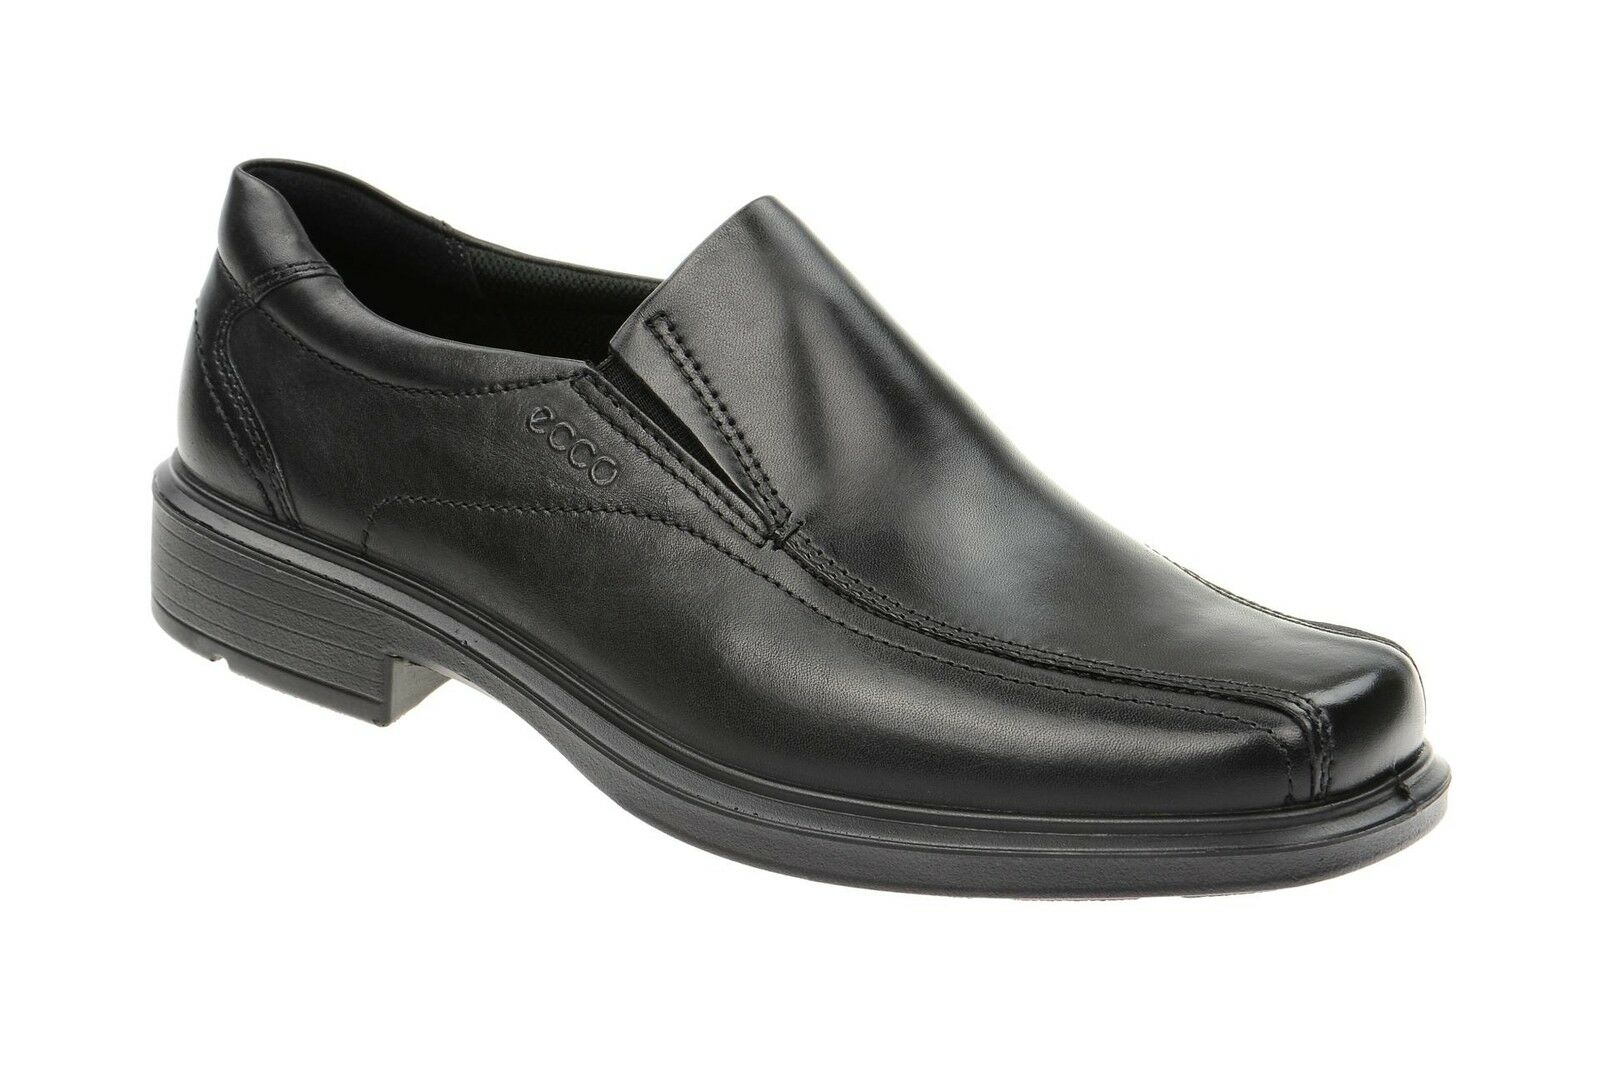 Details zu Digel Herren Schuhe Stiefeletten Sandro blau Echtleder Gummisohle leger